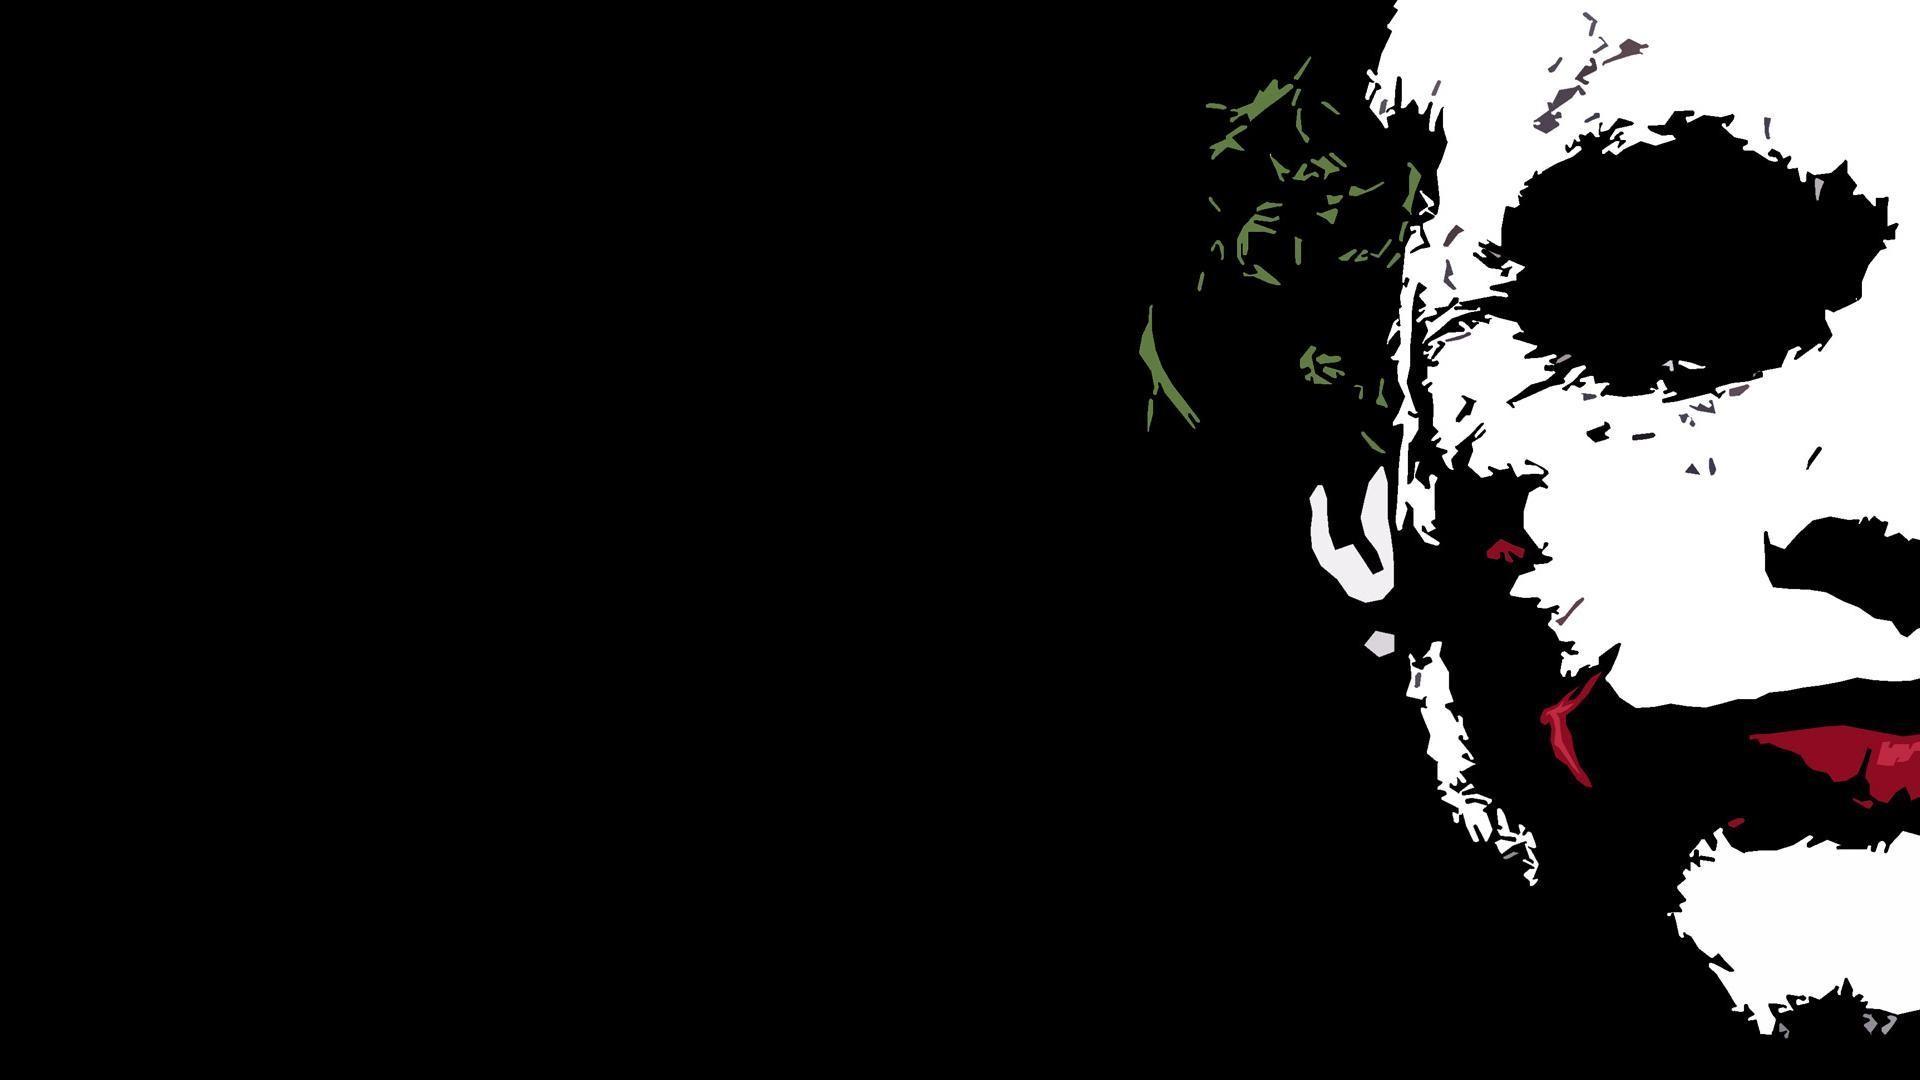 Joker Background 74 Pictures